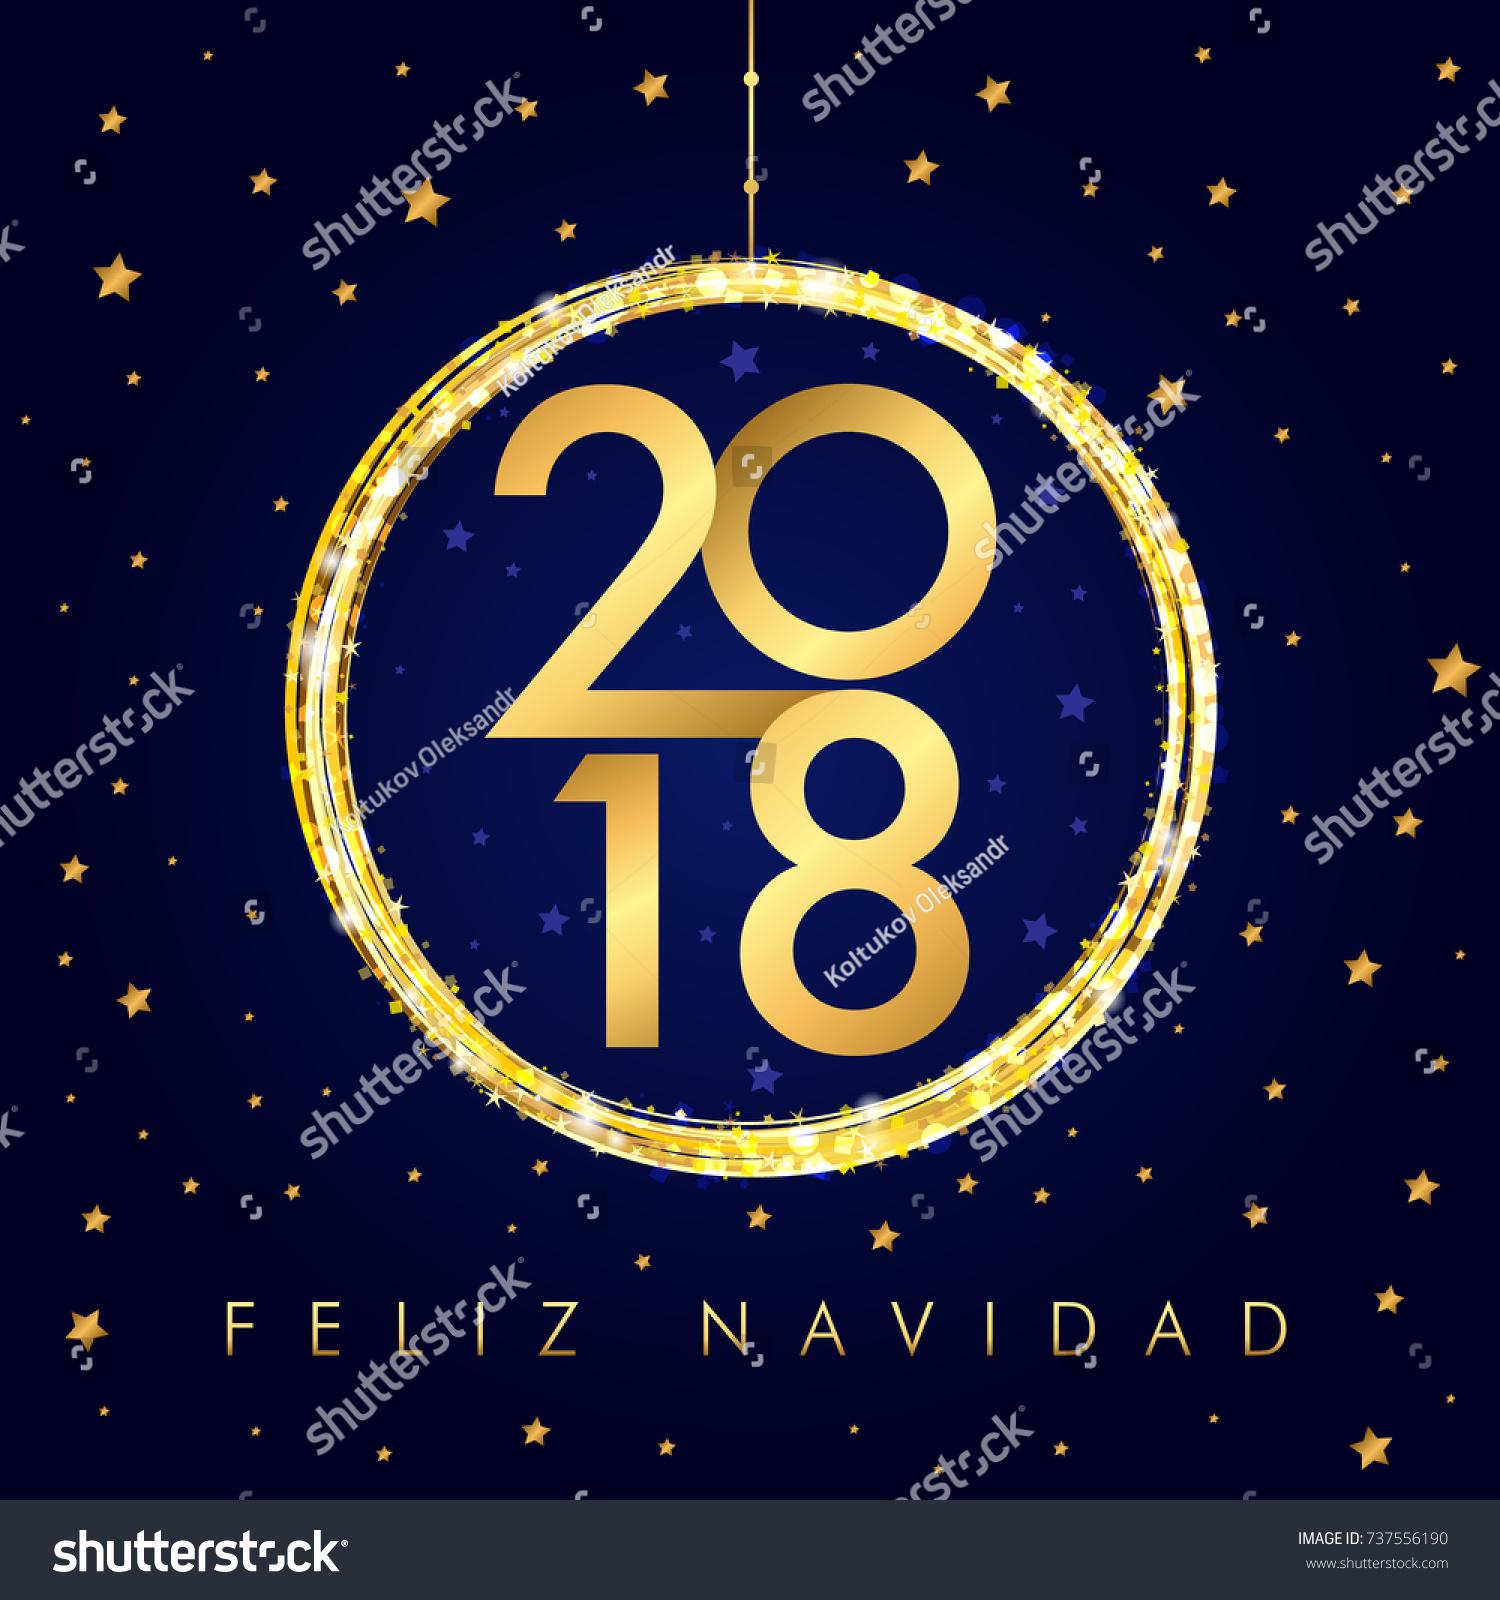 2018 feliz navidad happy new year stock vector royalty free 2018 feliz navidad happy new year golden ball card spanish merry christmas feliz navidad greeting m4hsunfo